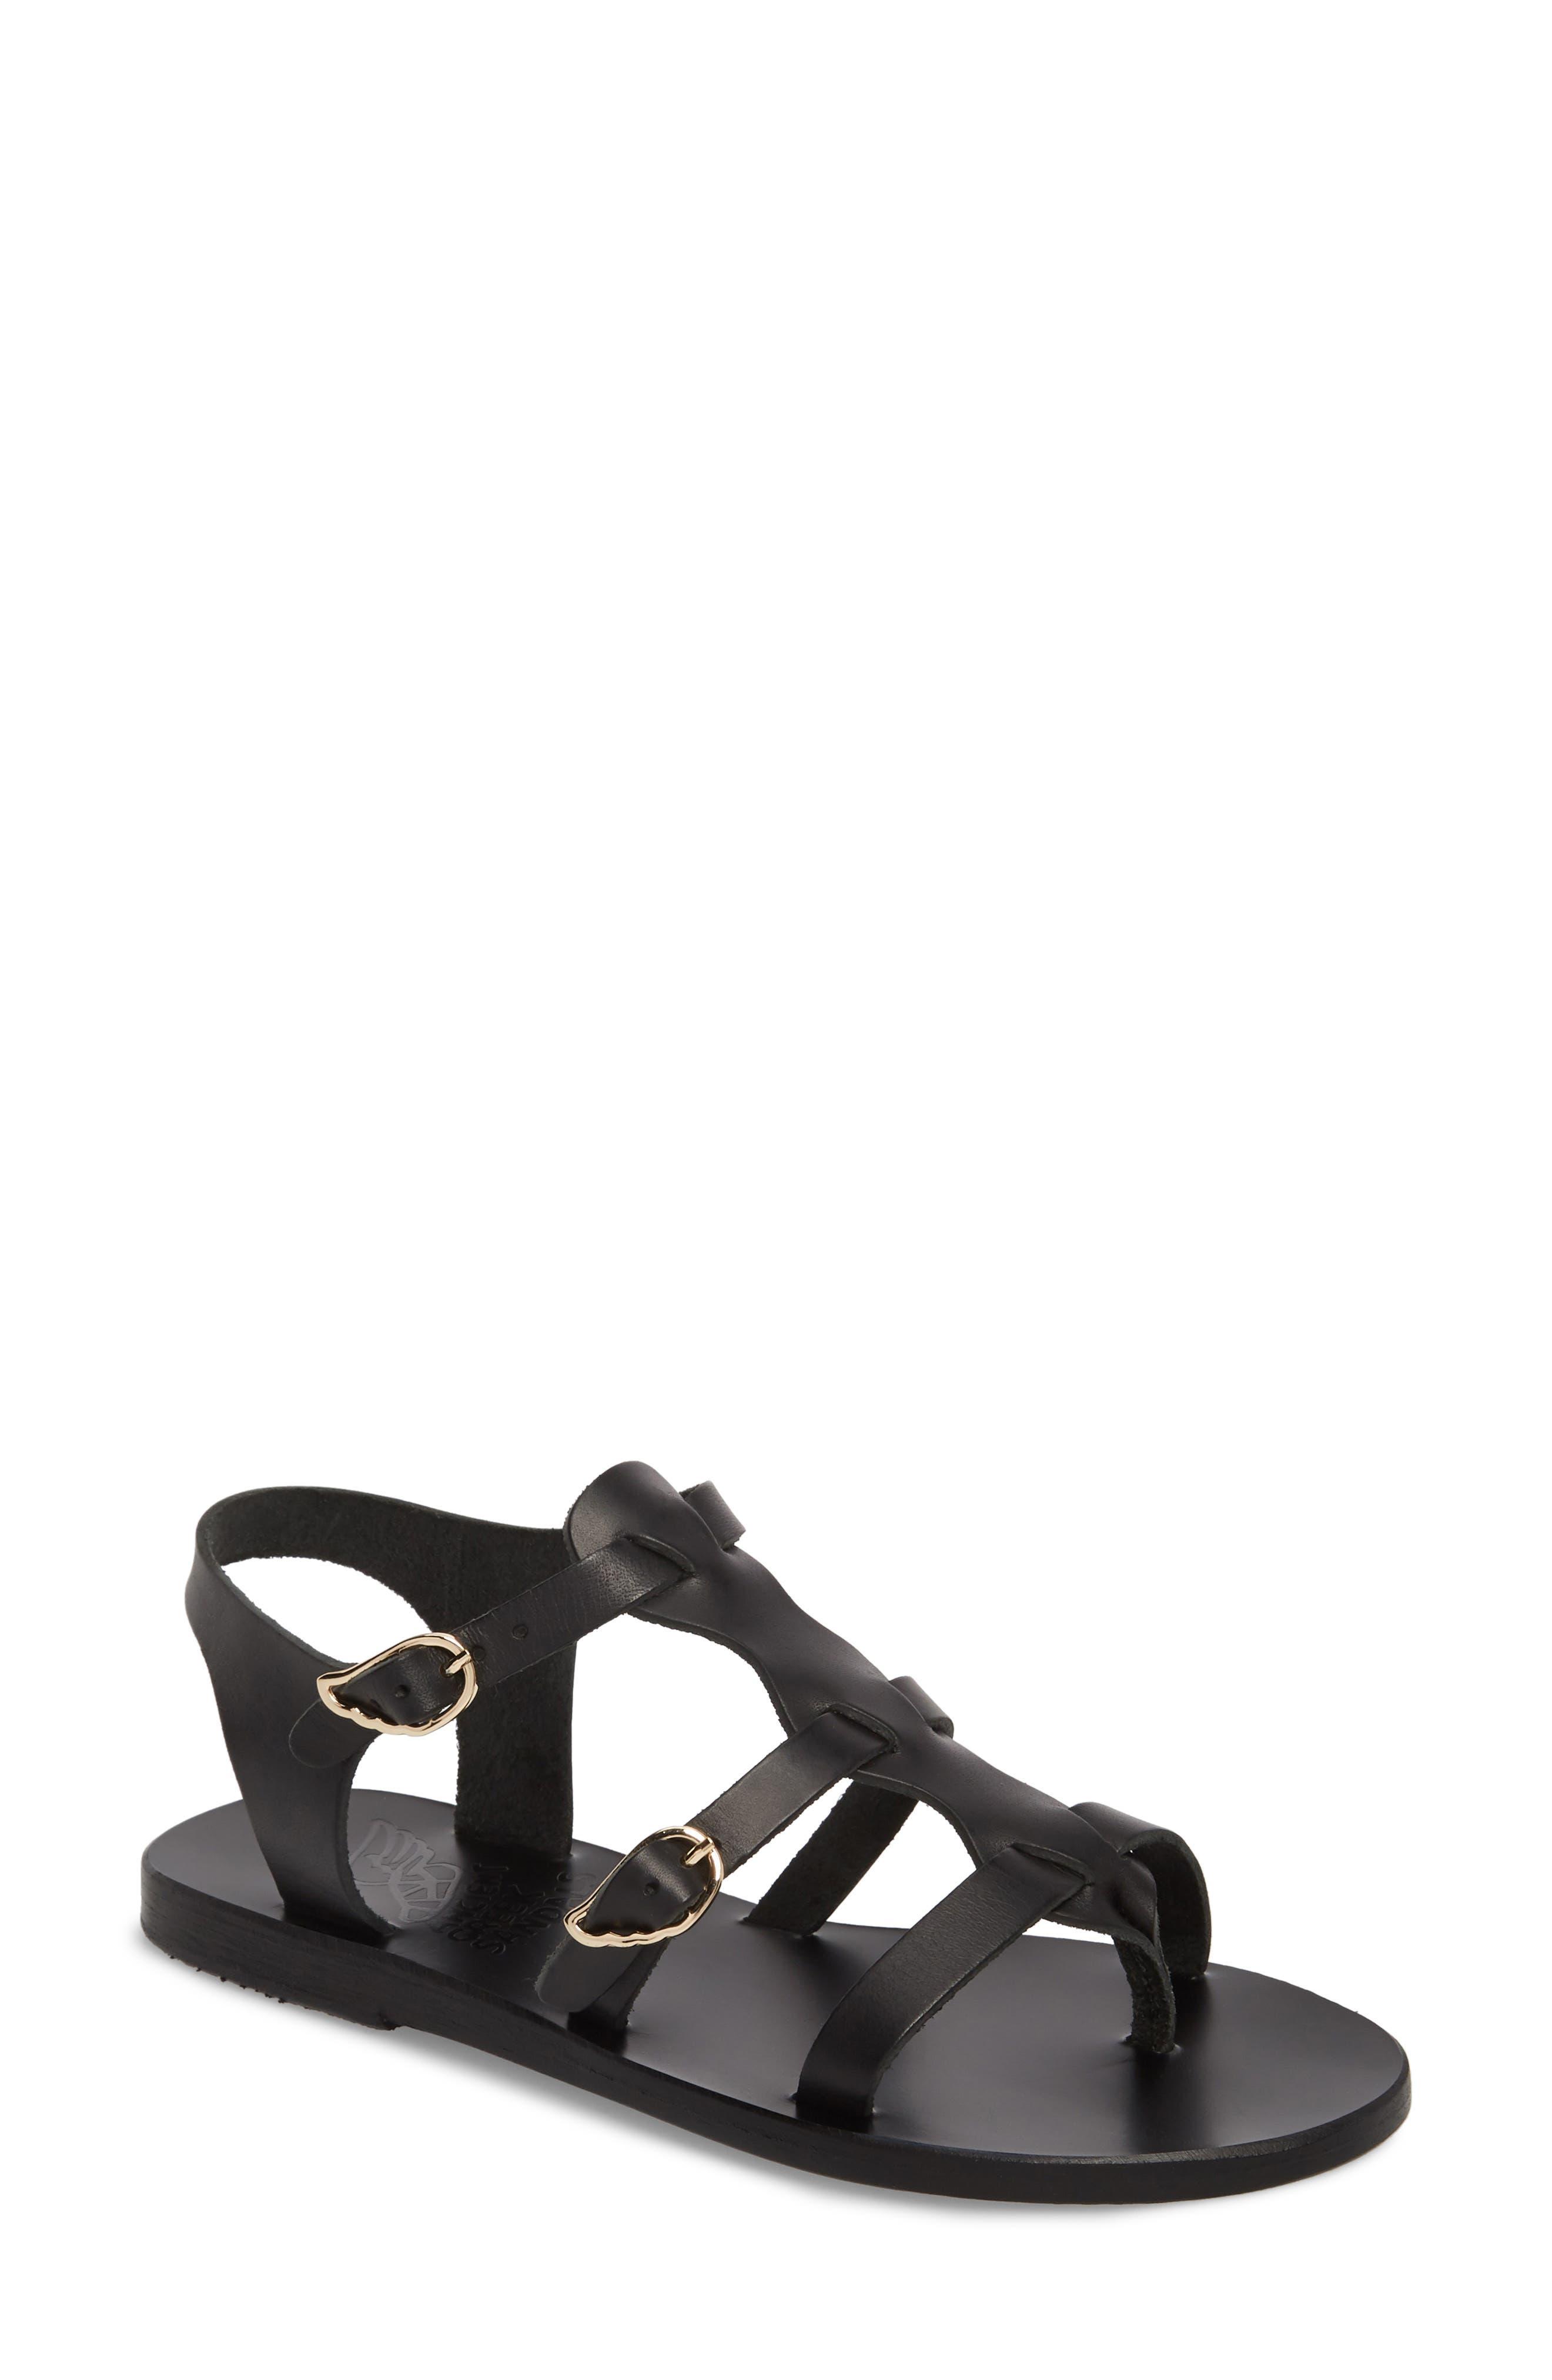 Ancient Greek Sandals Flats T-STRAP SANDAL